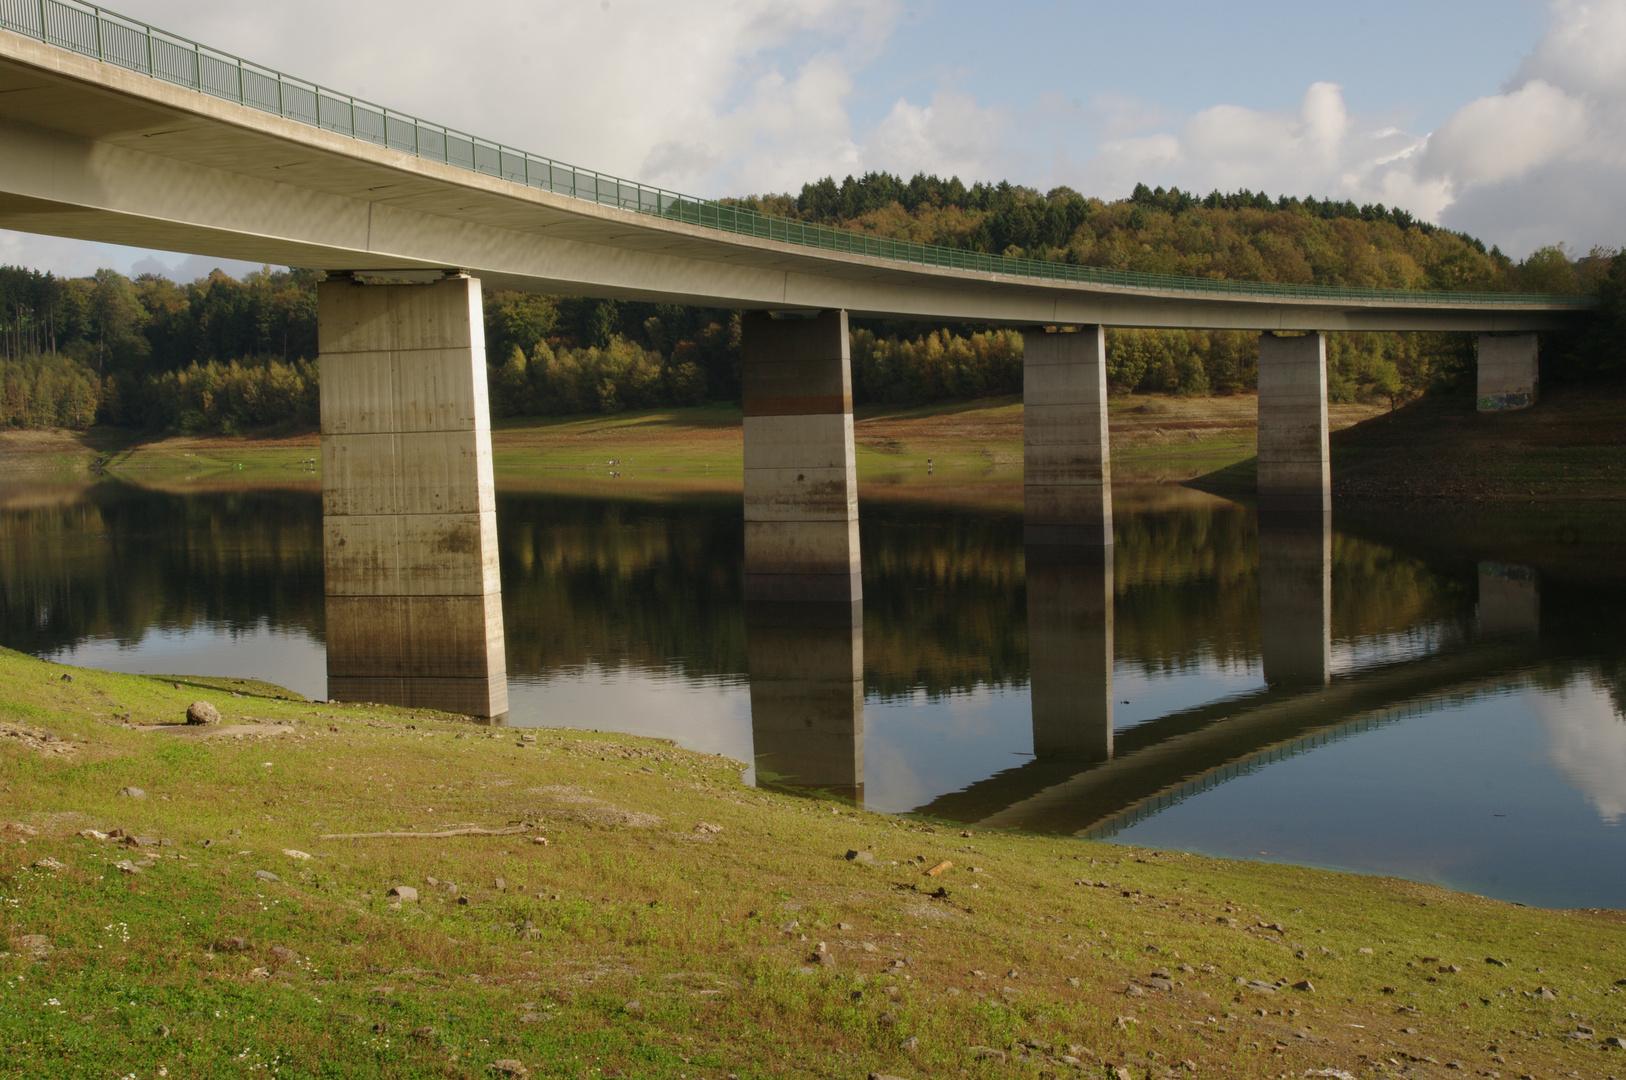 Talbrücke Krähwinkel über die Wuppersperre